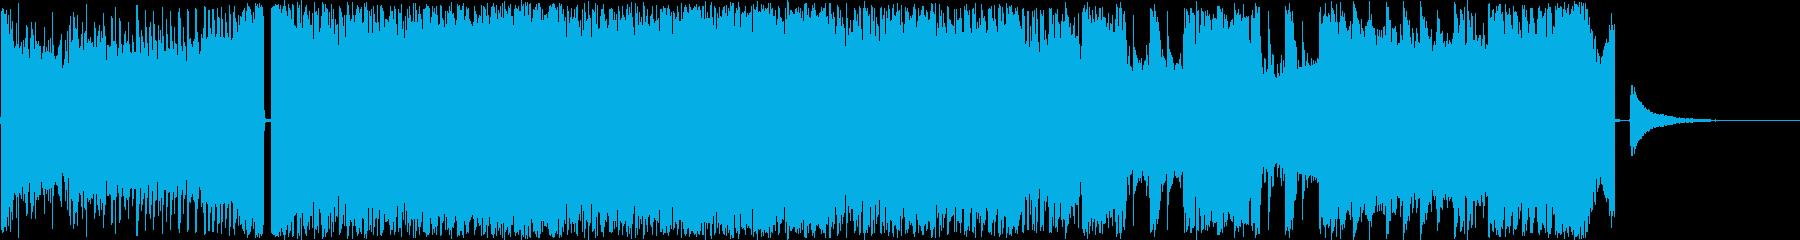 EDM.ロック.企業用CM等の再生済みの波形